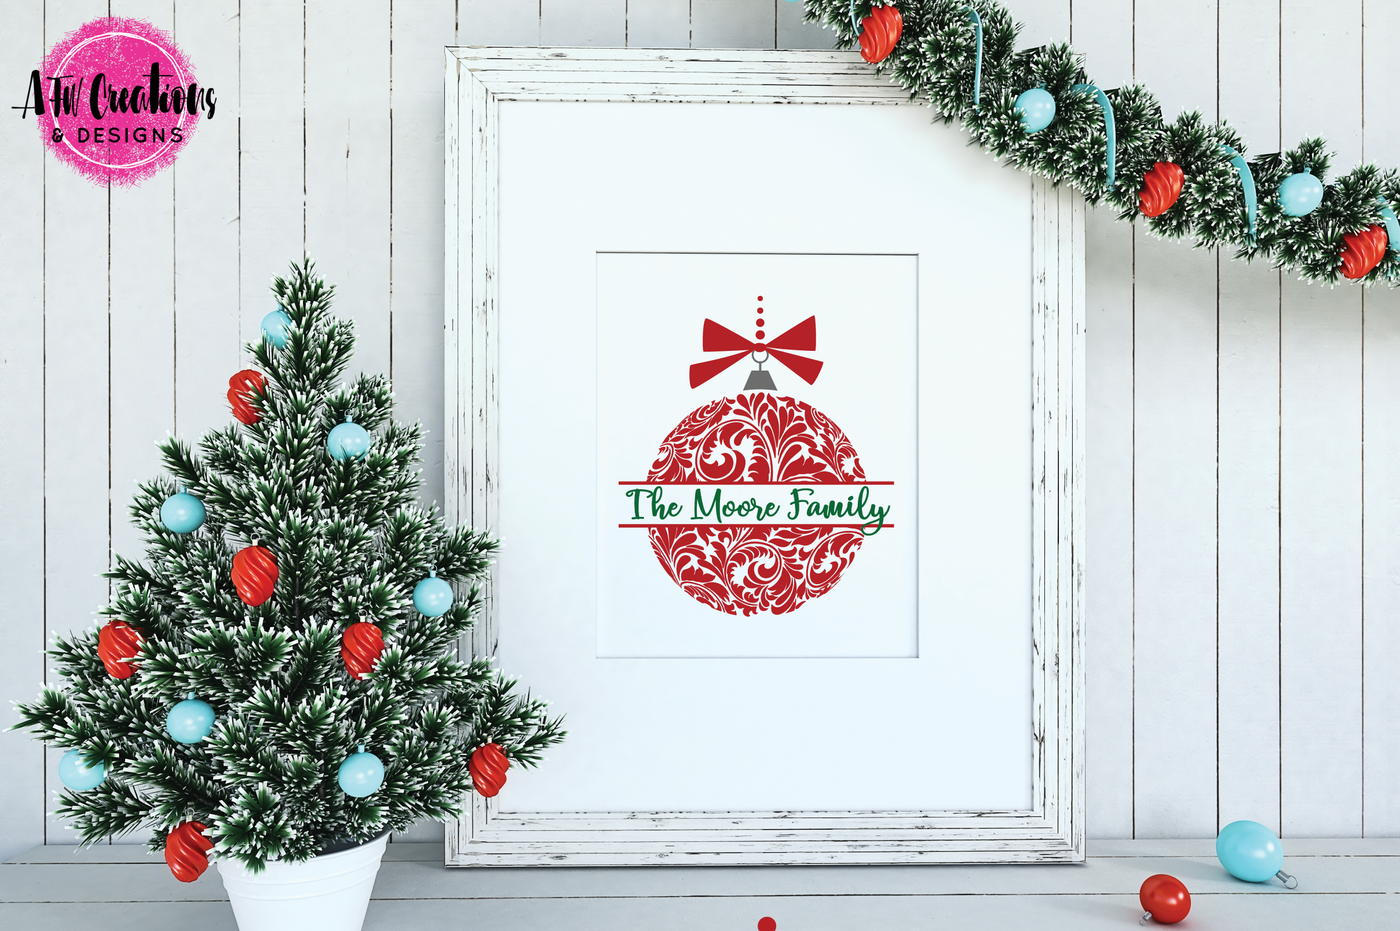 Flourish Christmas Ornaments Svg Dxf Eps Cut Files By Afw